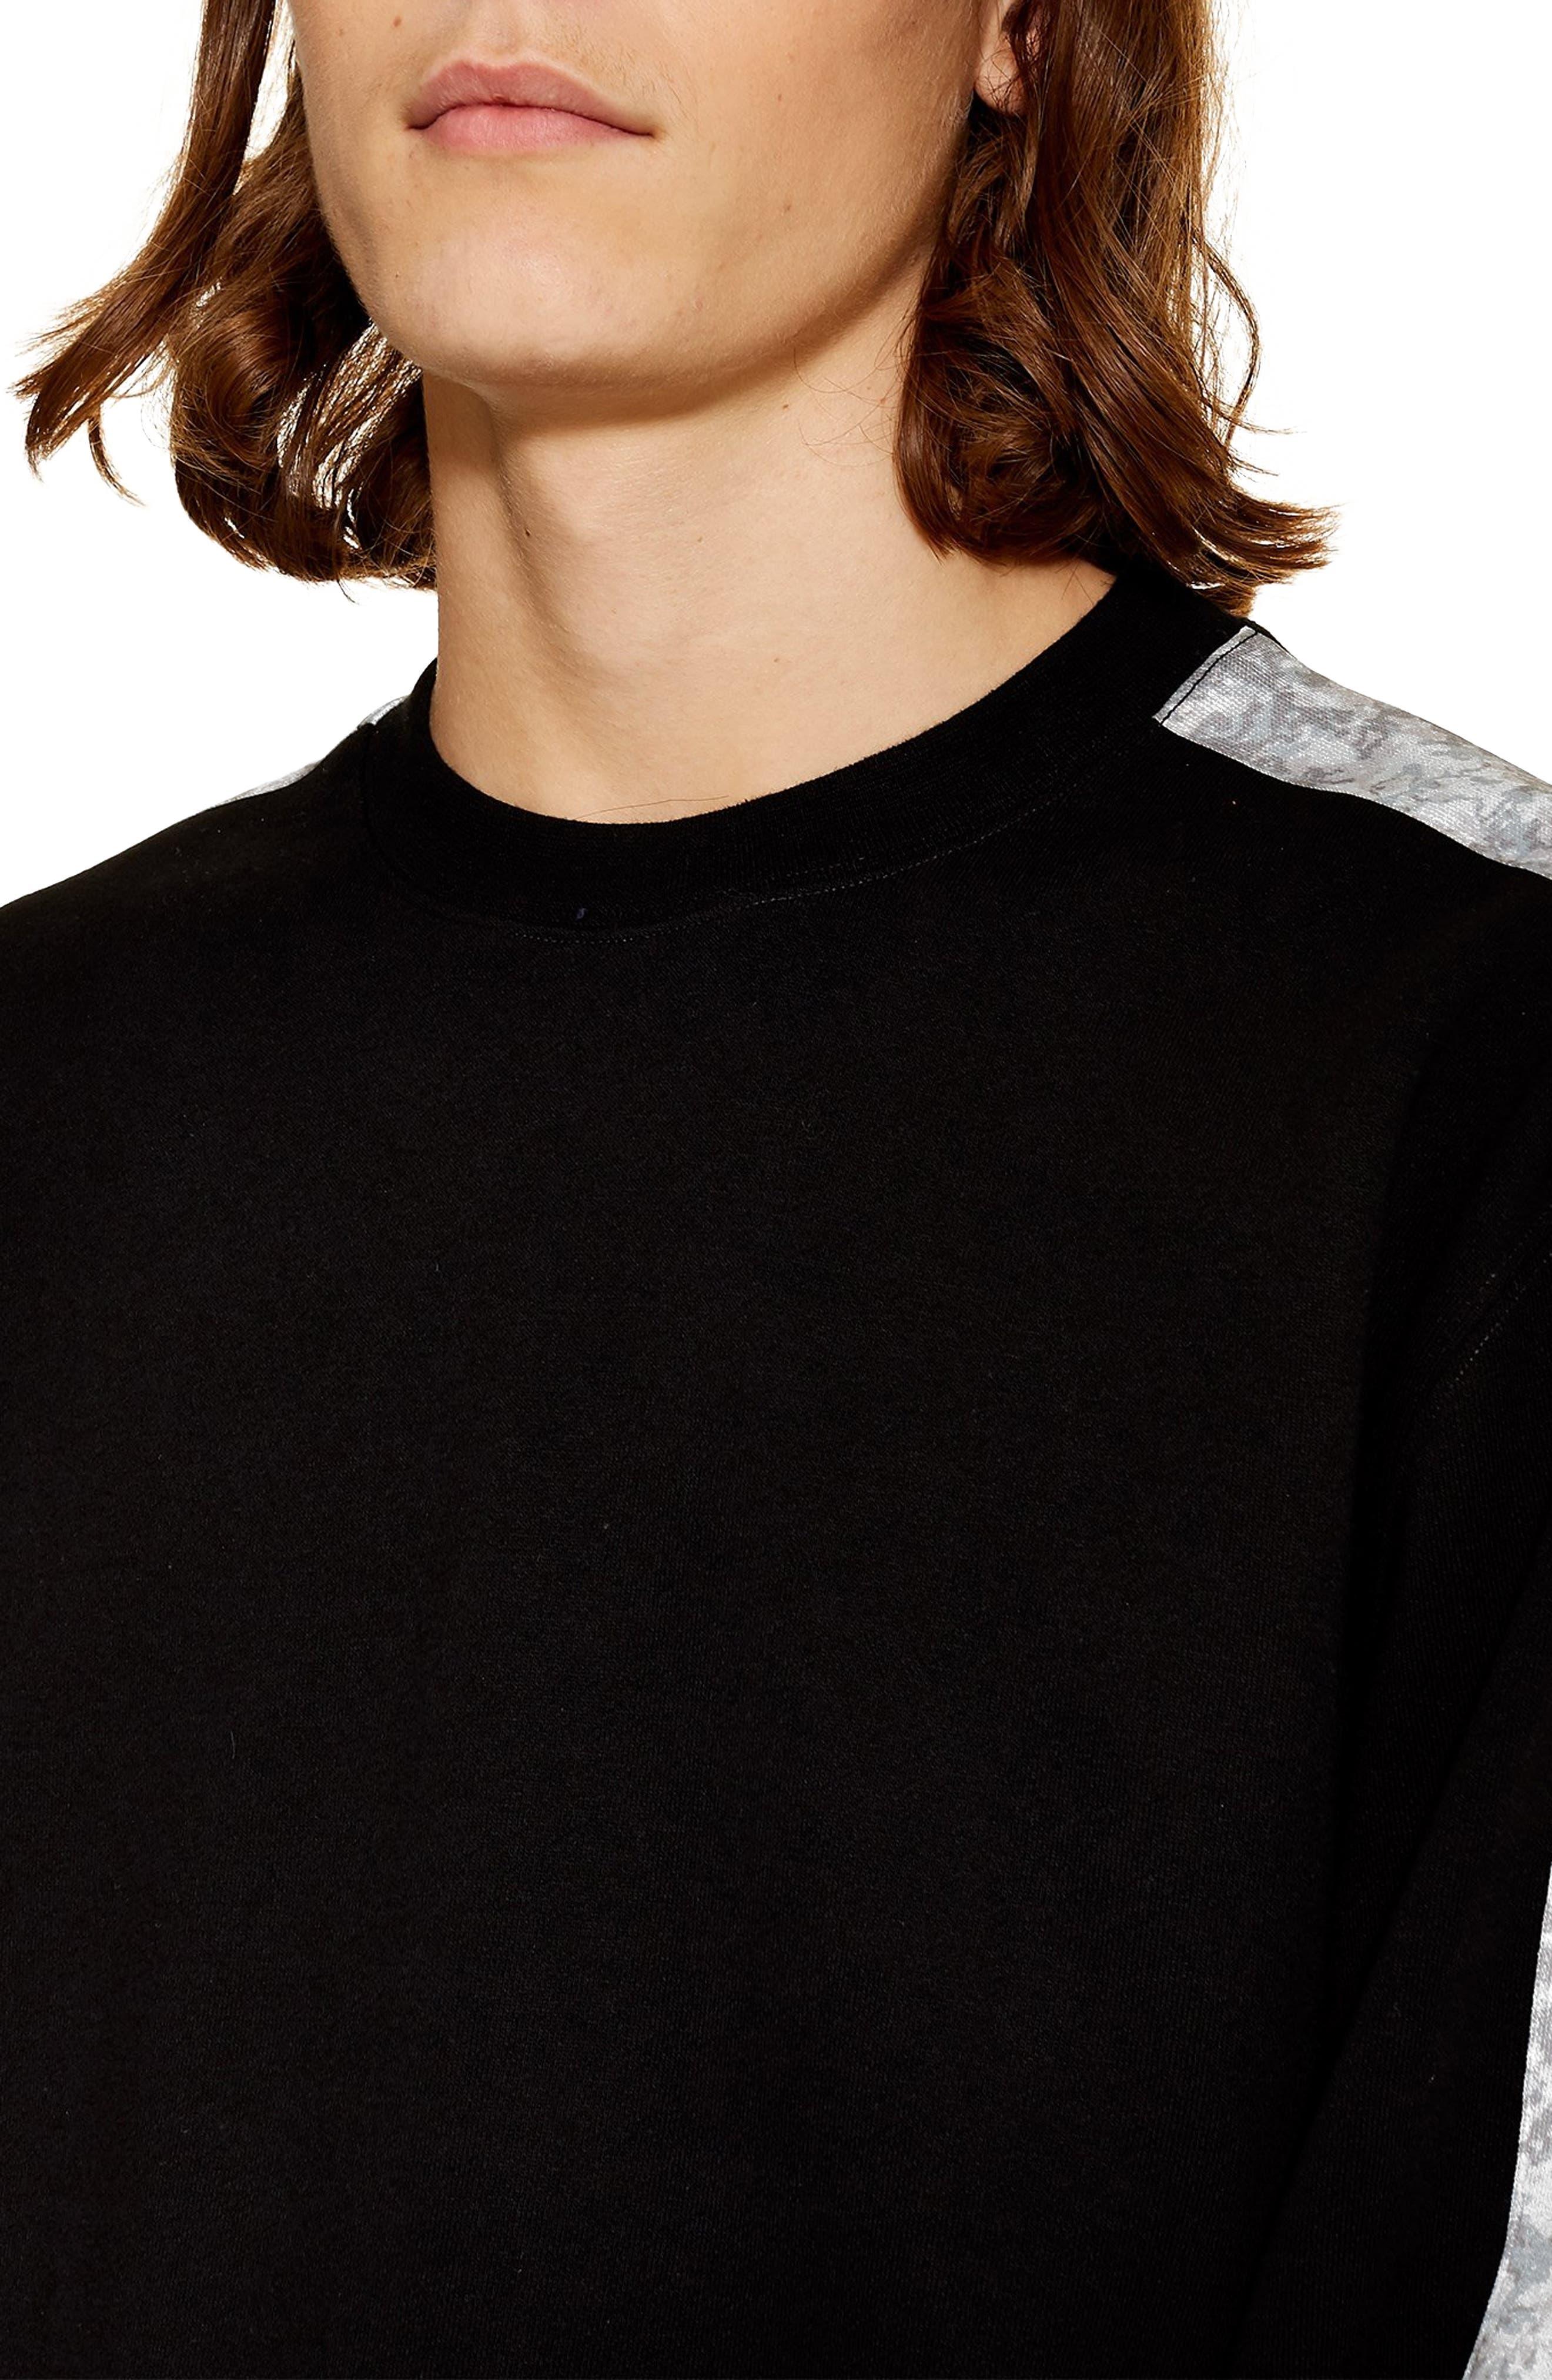 Sublimated Tape Crewneck Sweatshirt,                             Alternate thumbnail 3, color,                             BLACK MULTI